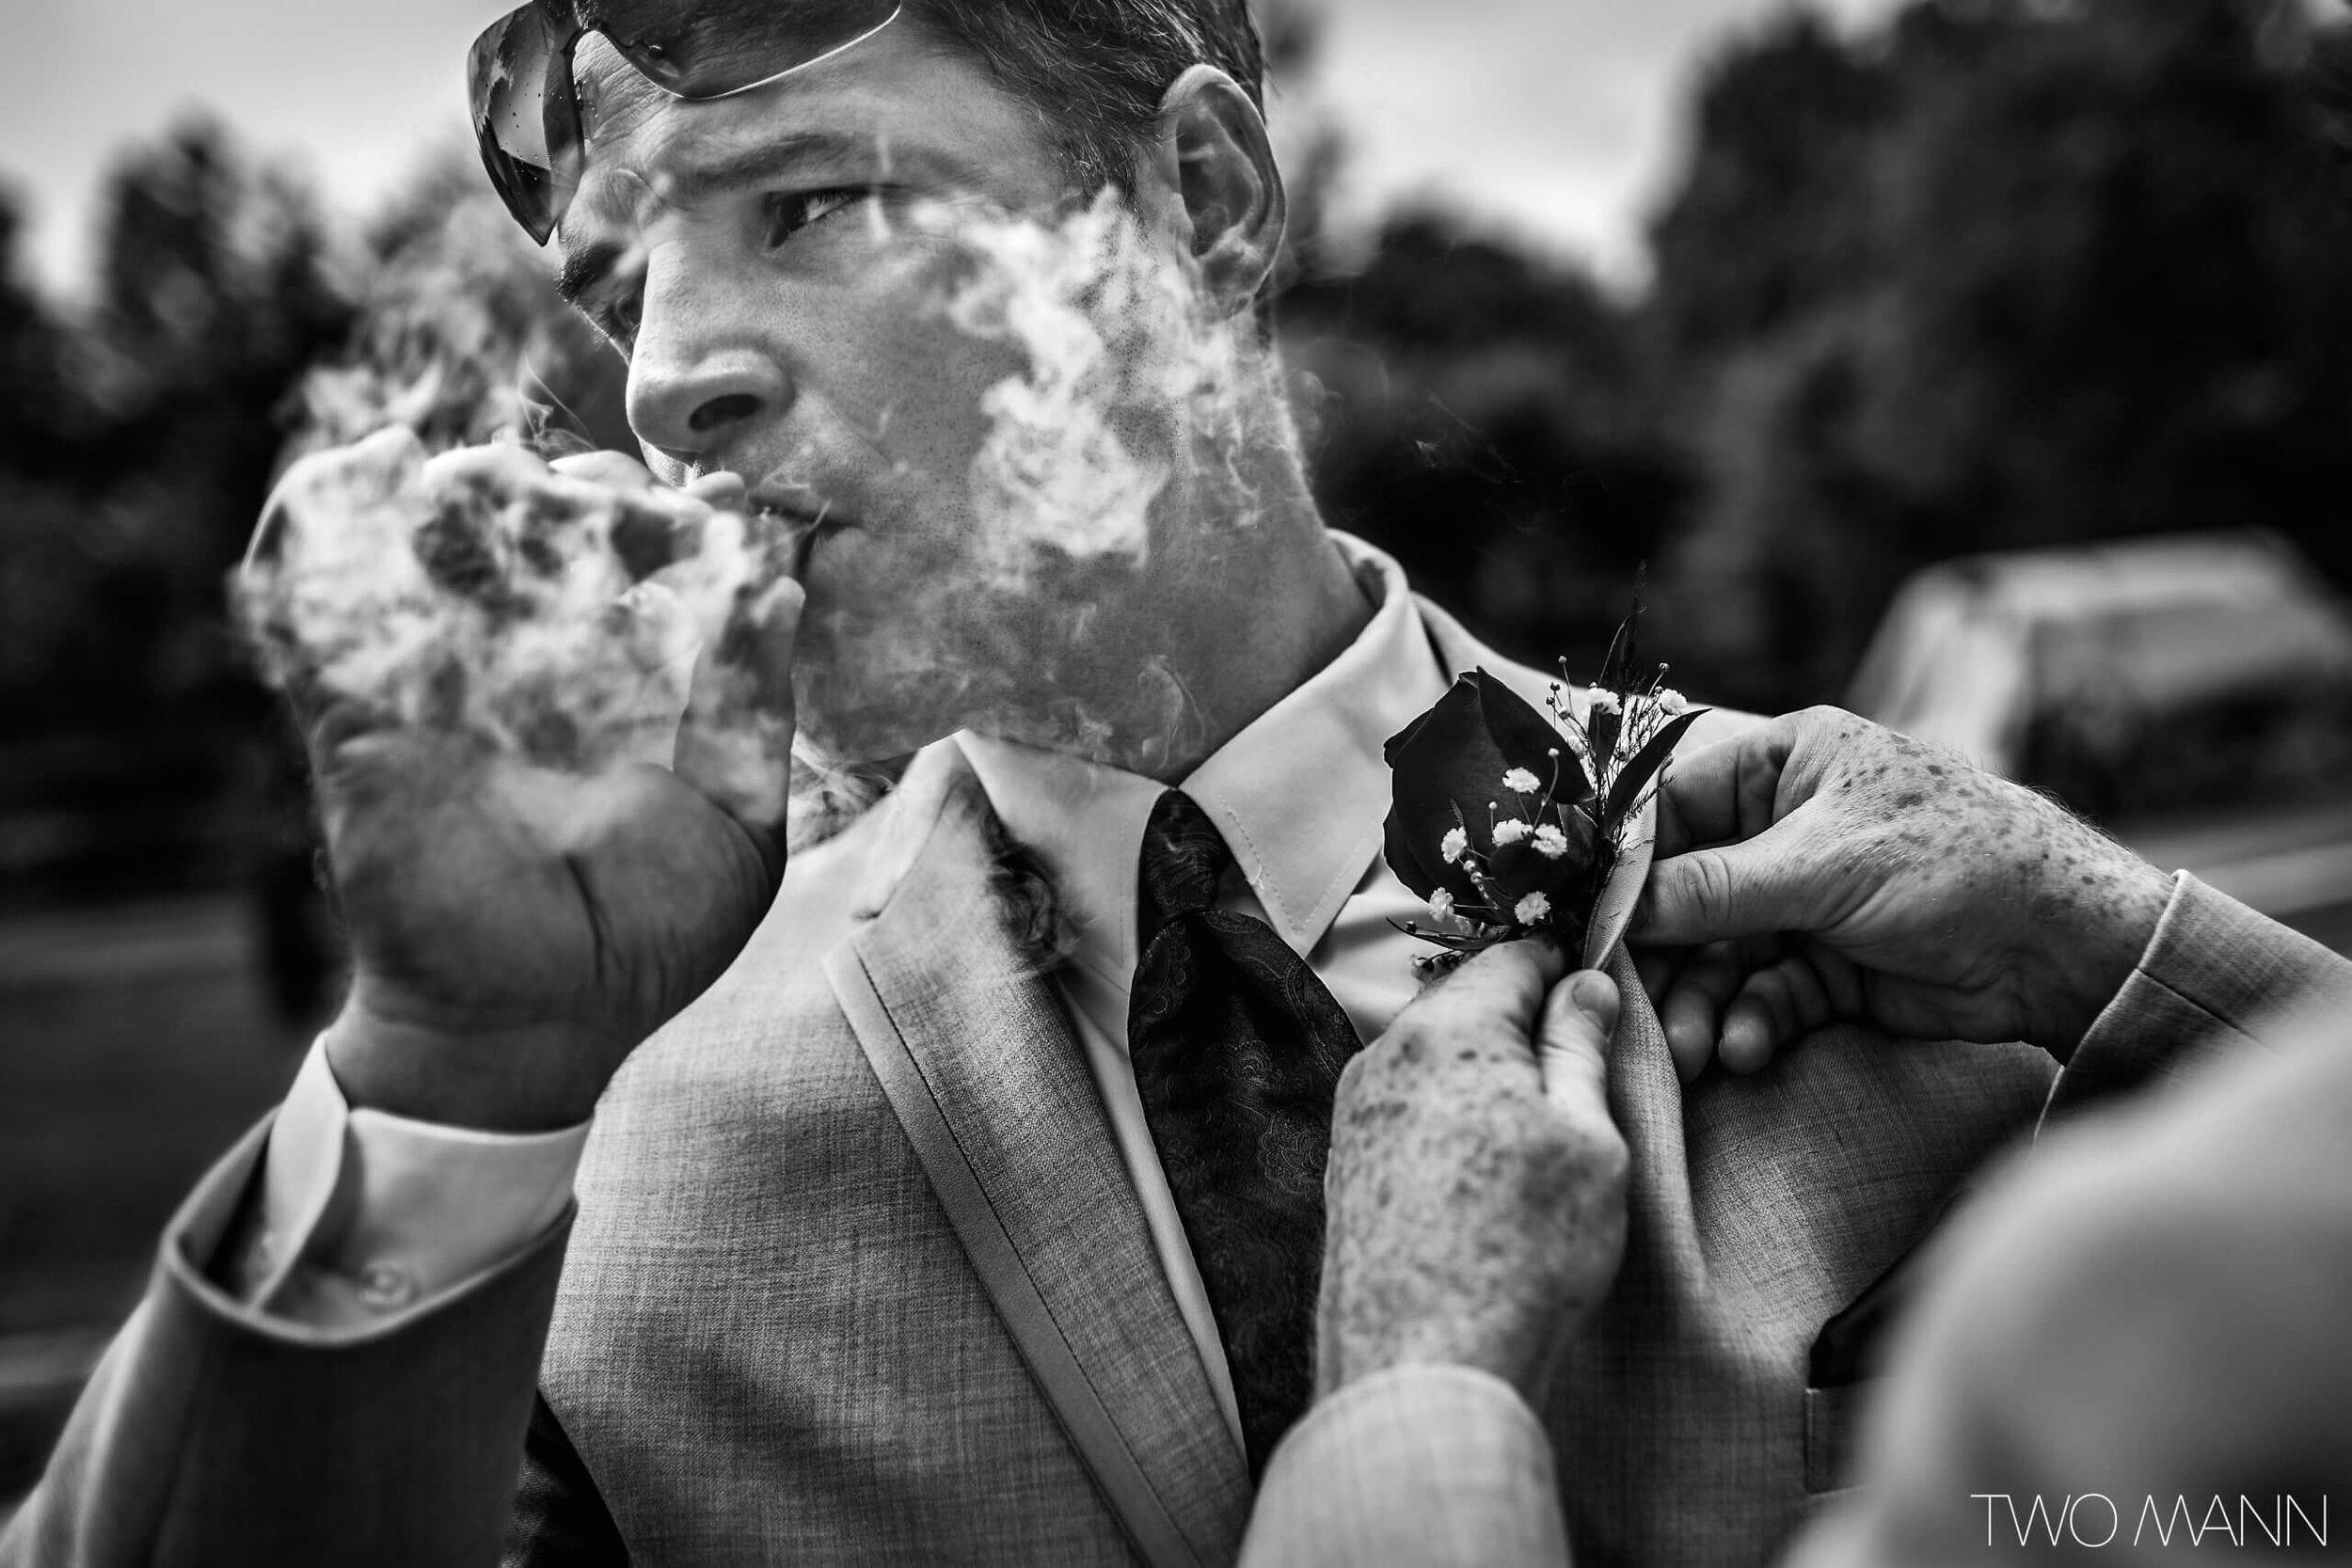 Two-Mann-Studios-Worlds-Best-Wedding-Photography-Best-of-2016-056-2560x1707.jpg